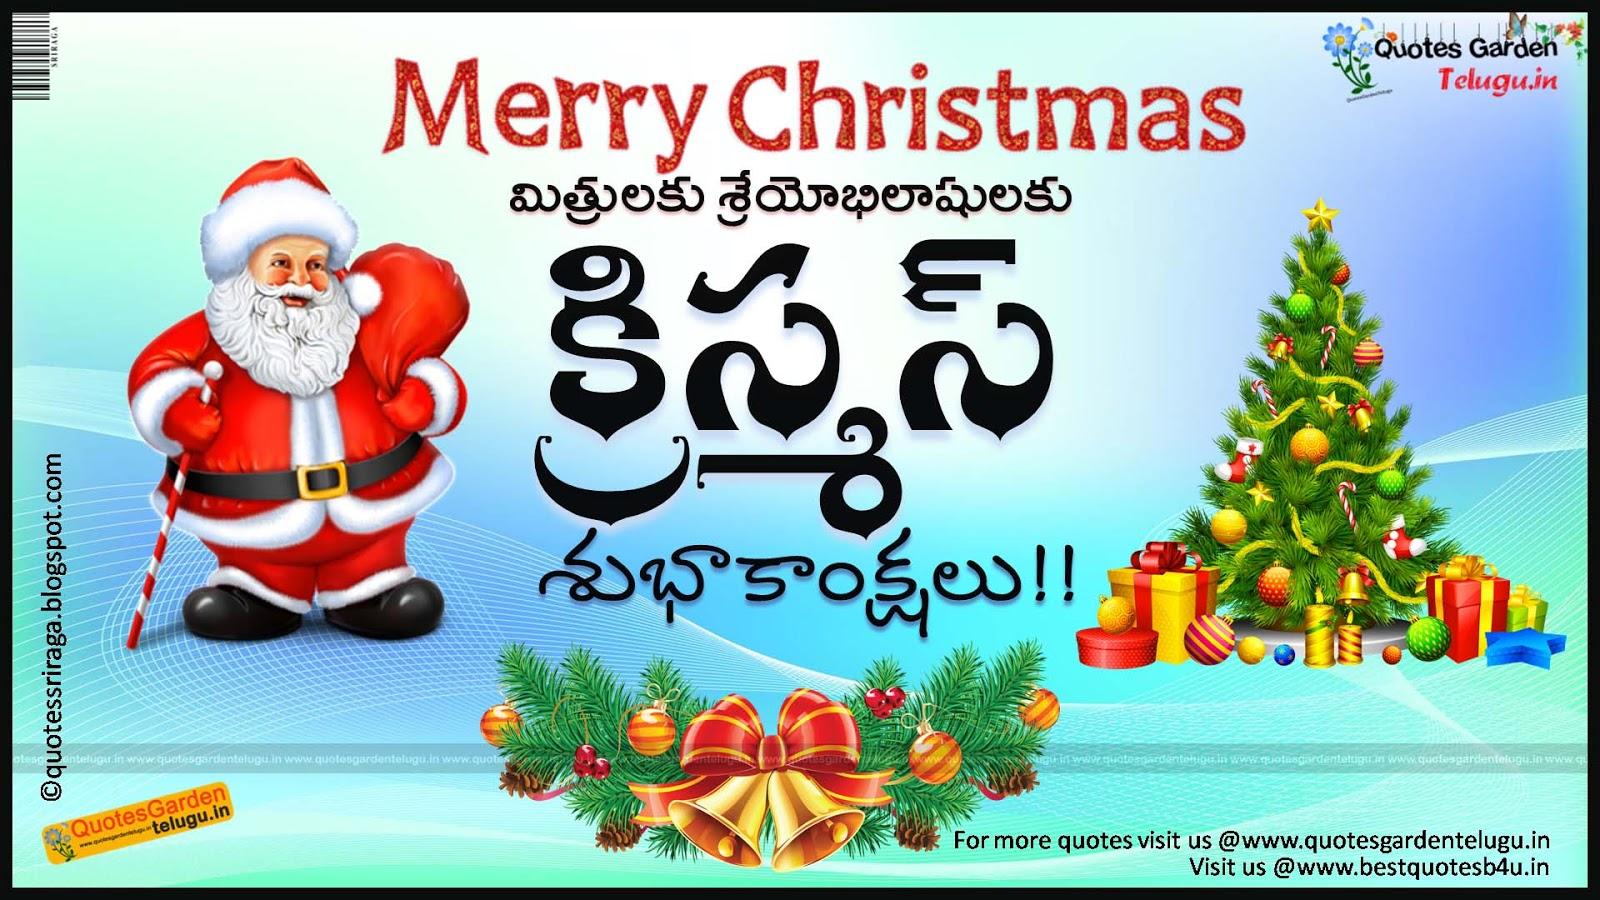 Telugu Christmas Greetings Wallpapers Quotes Garden Telugu